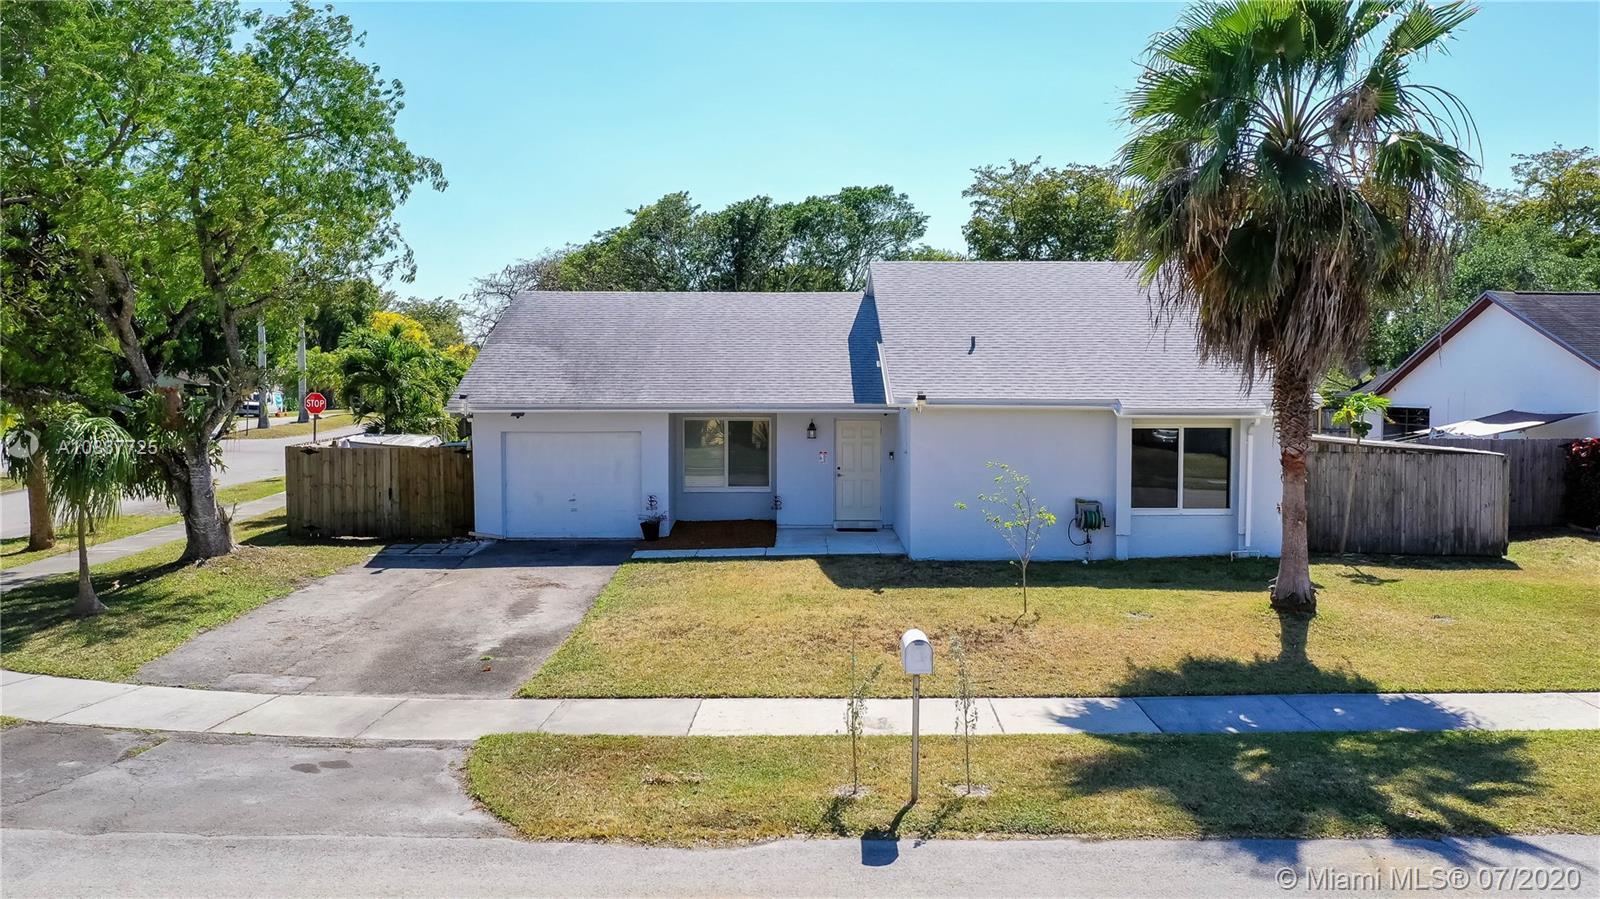 986 S Bluebird Ln Property Photo